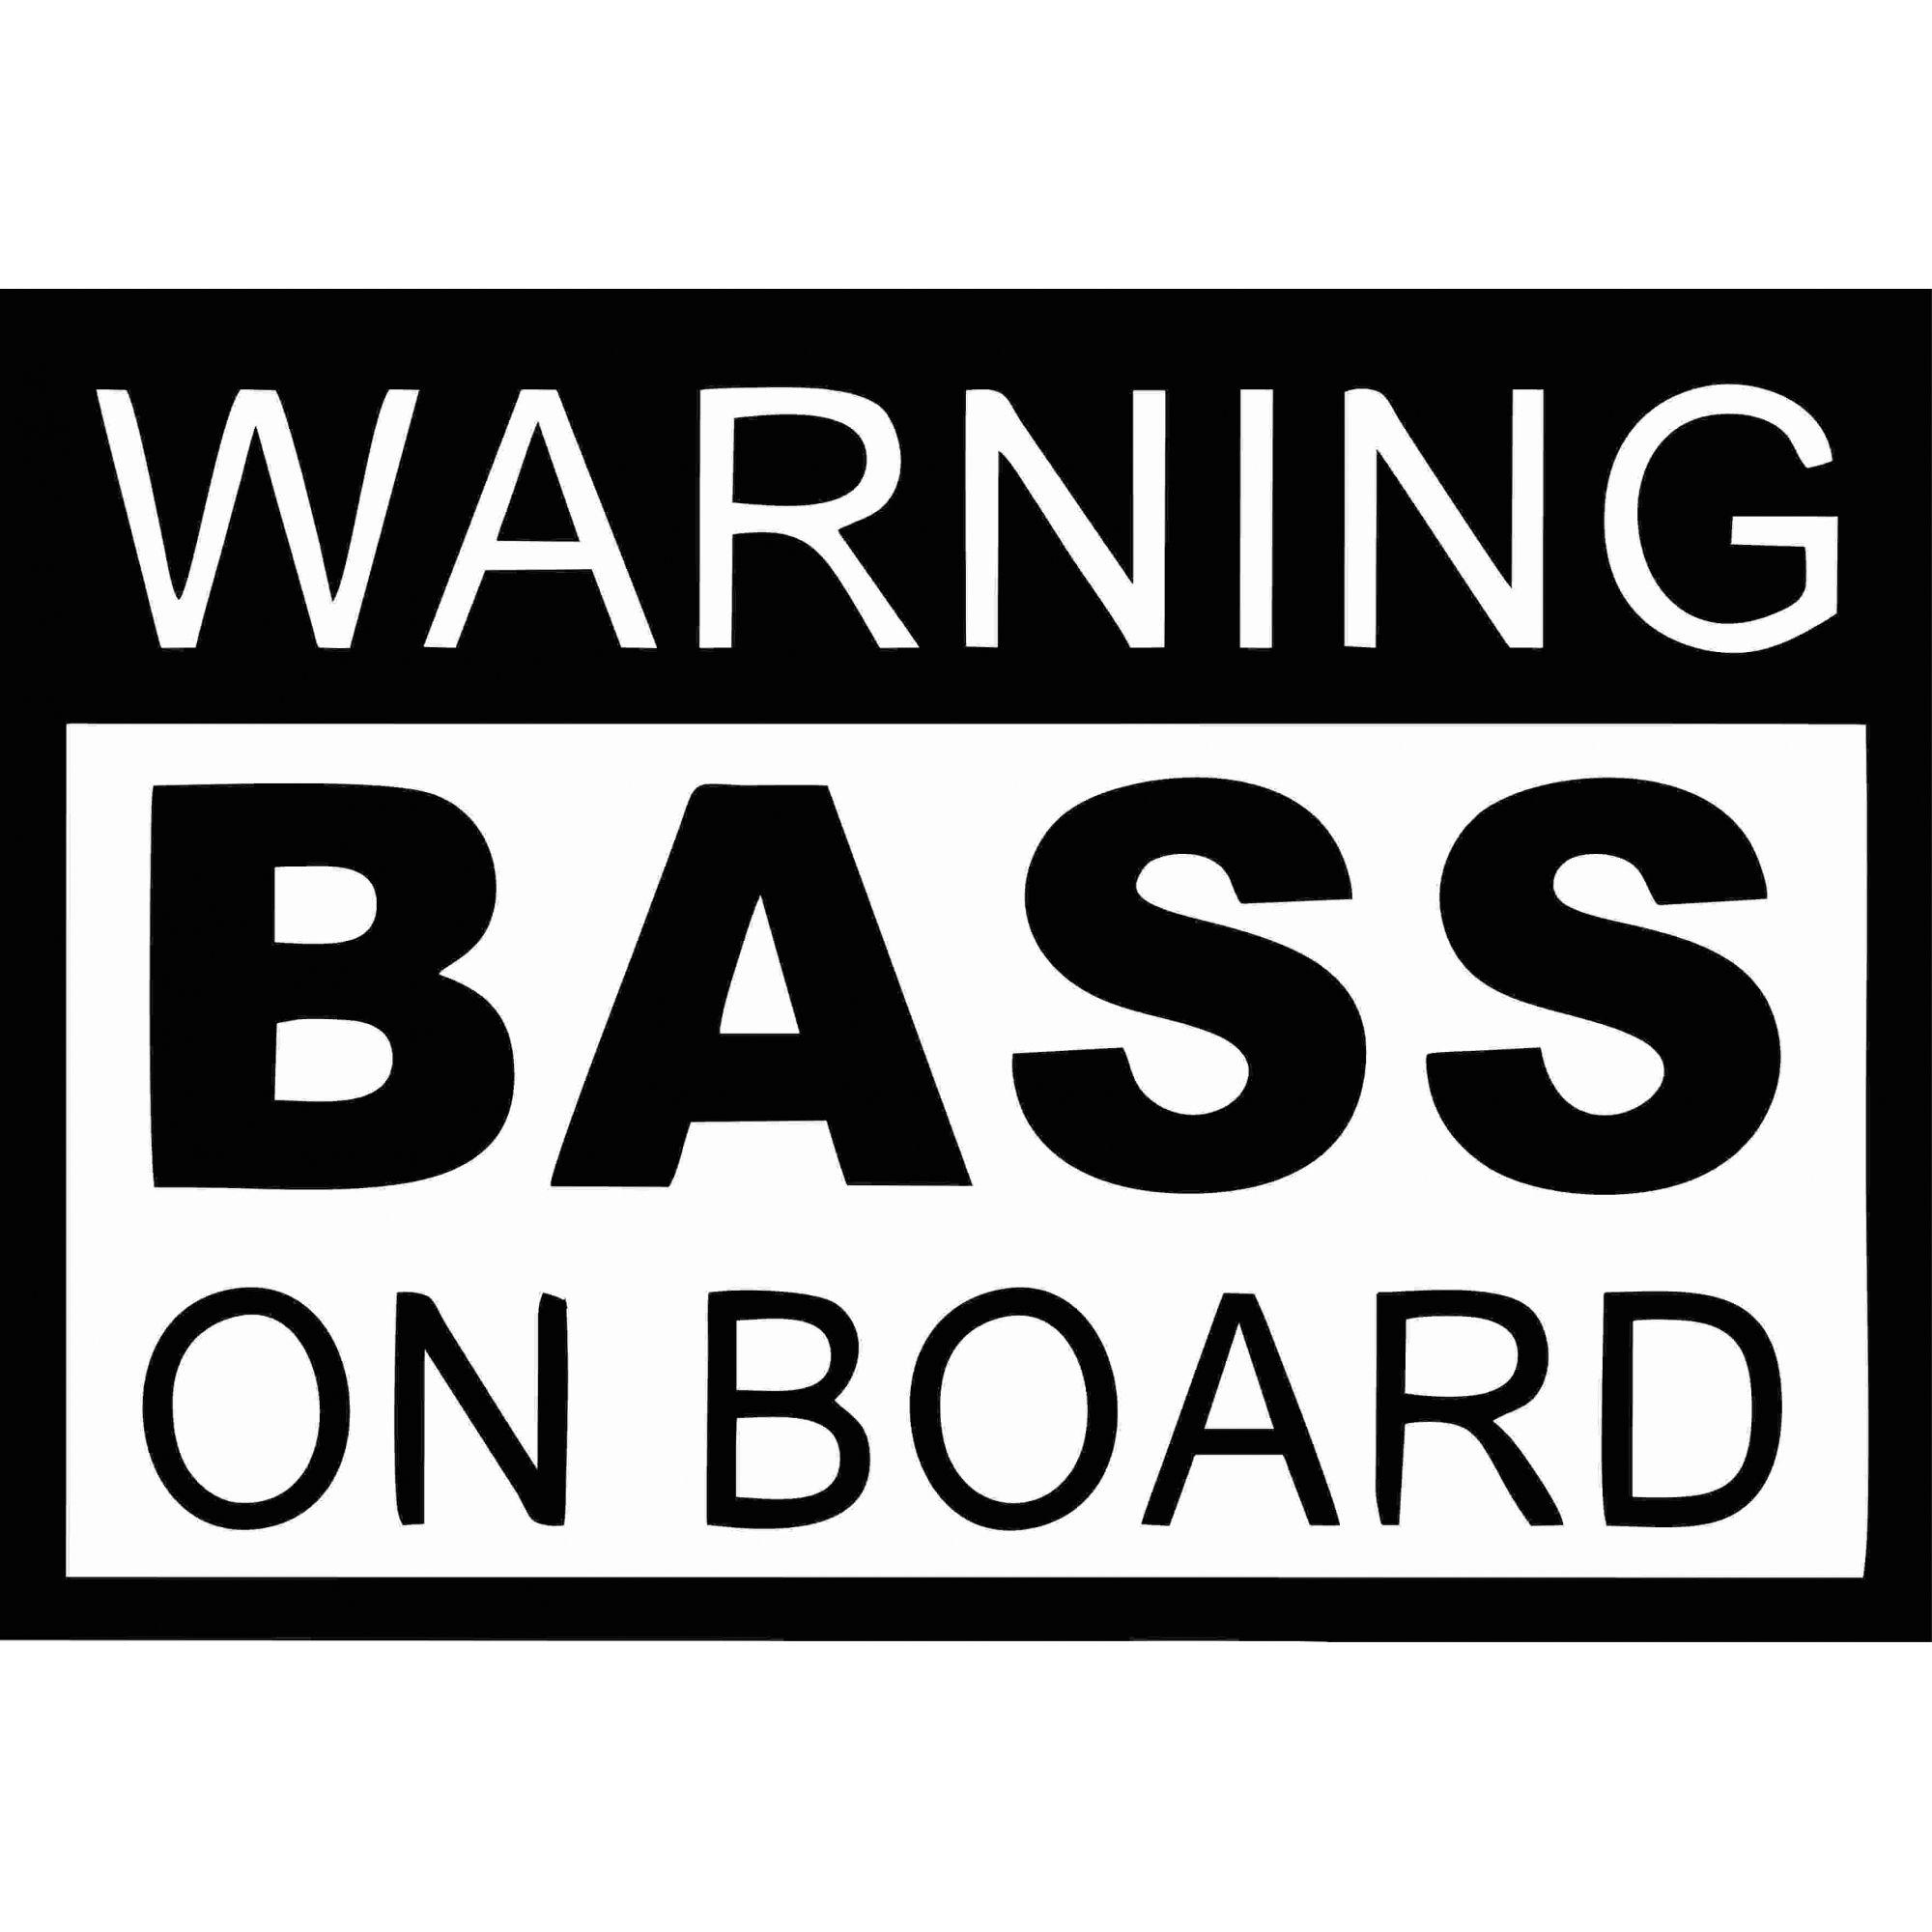 A1498 Auto Adesivo Automotivo Bass on Board